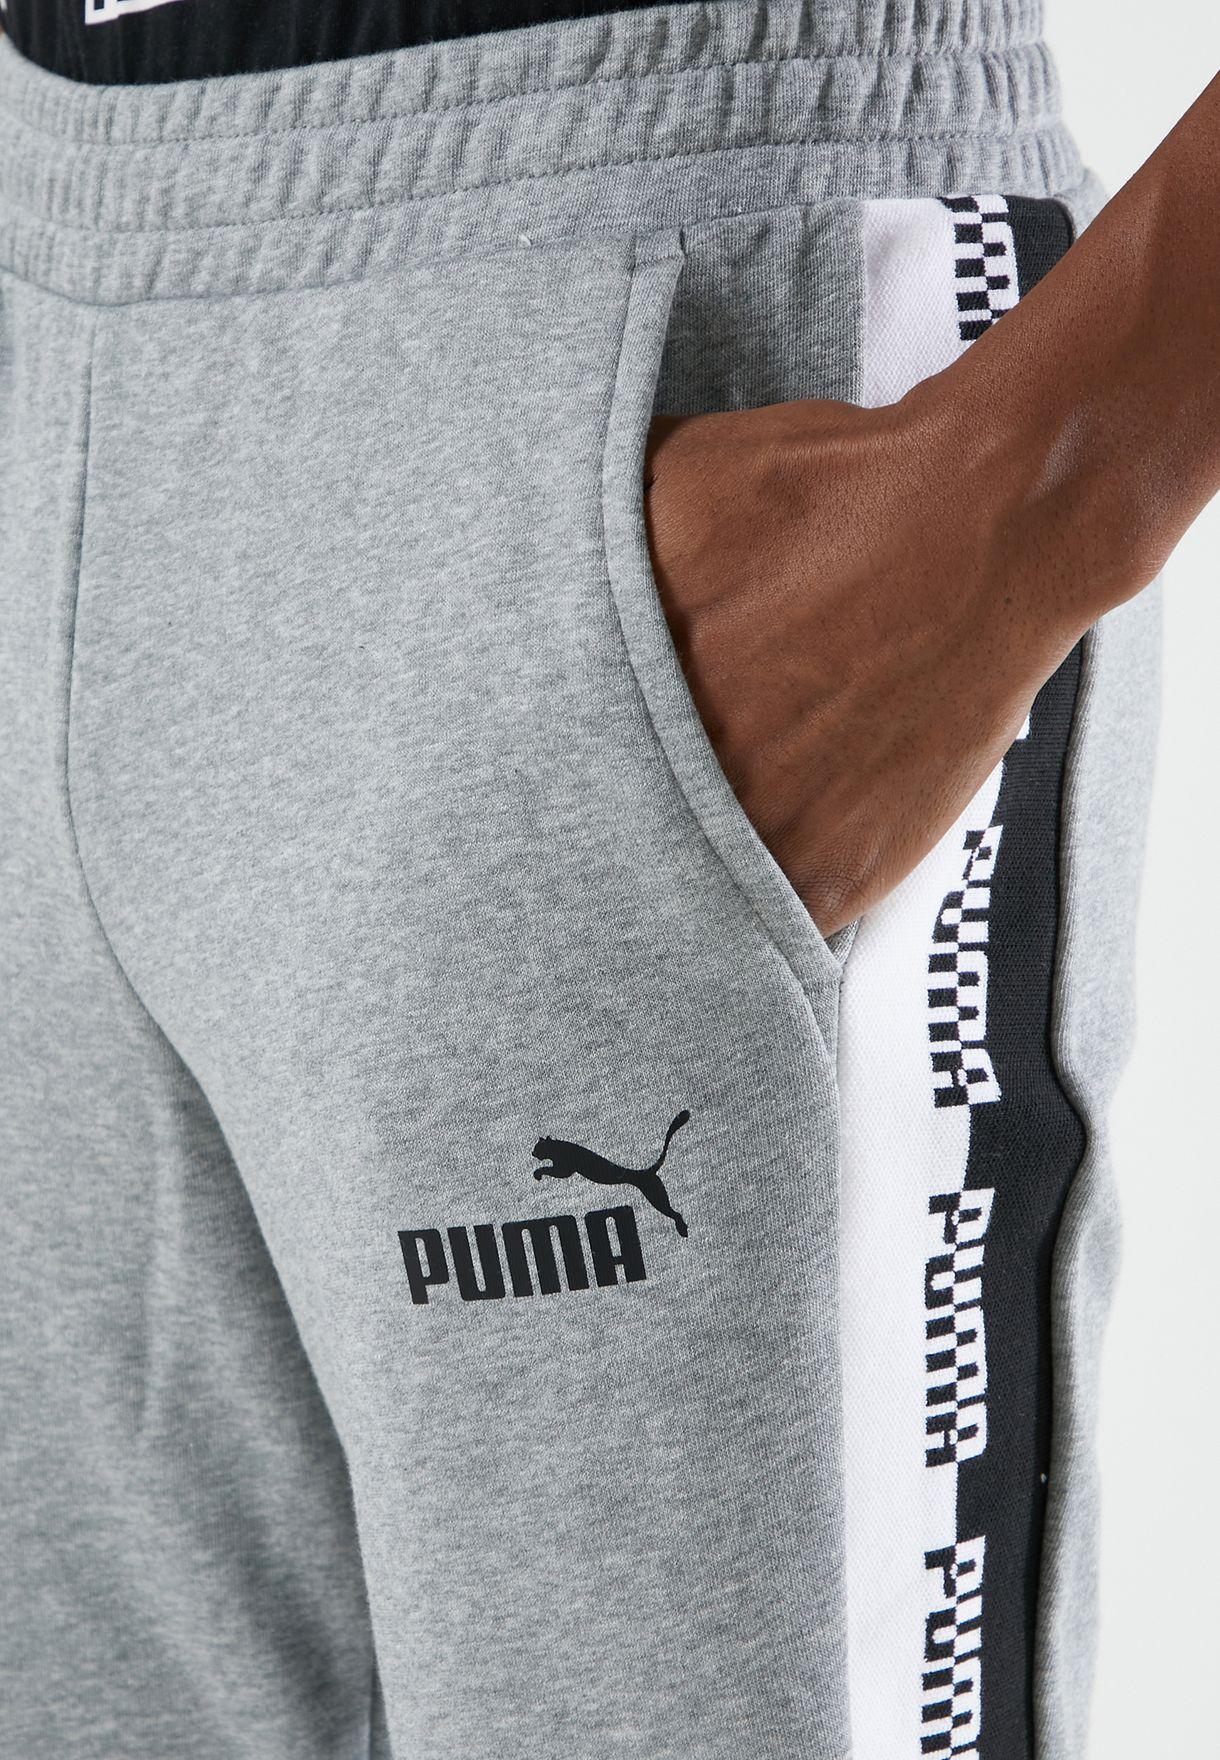 Amplified Sweatpants